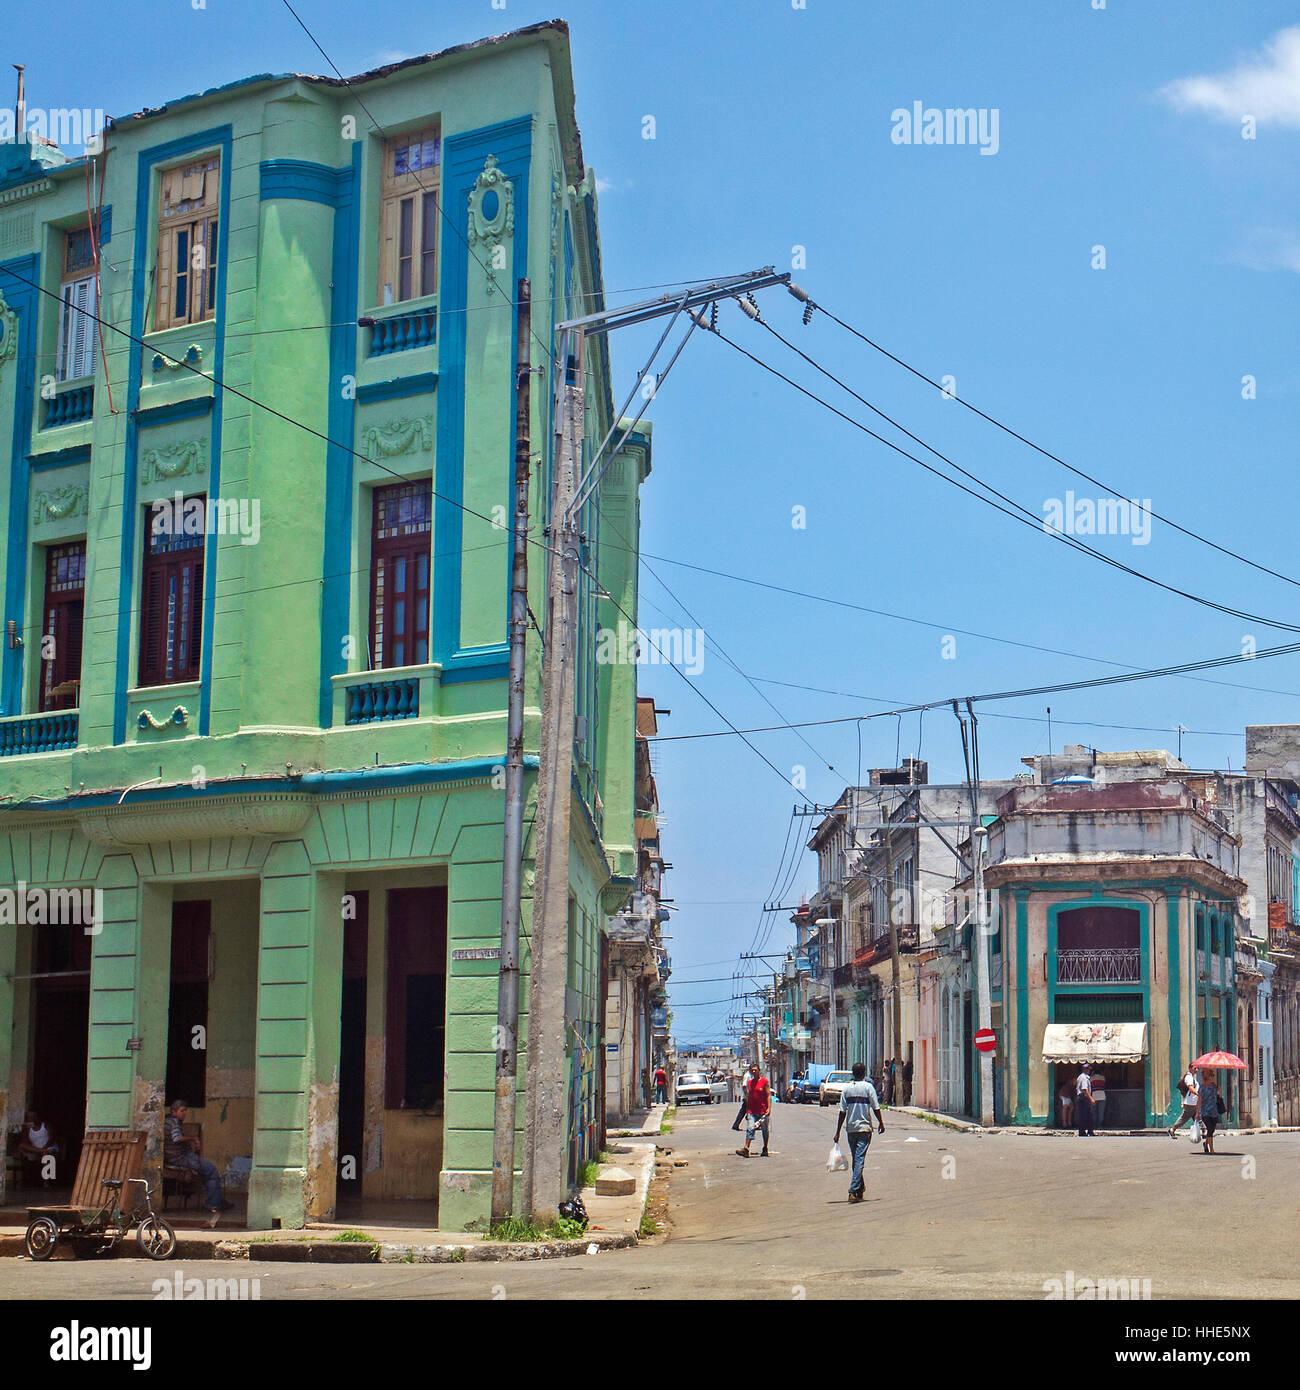 Straße Konvergenz Havanna Zentralkuba Stockbild